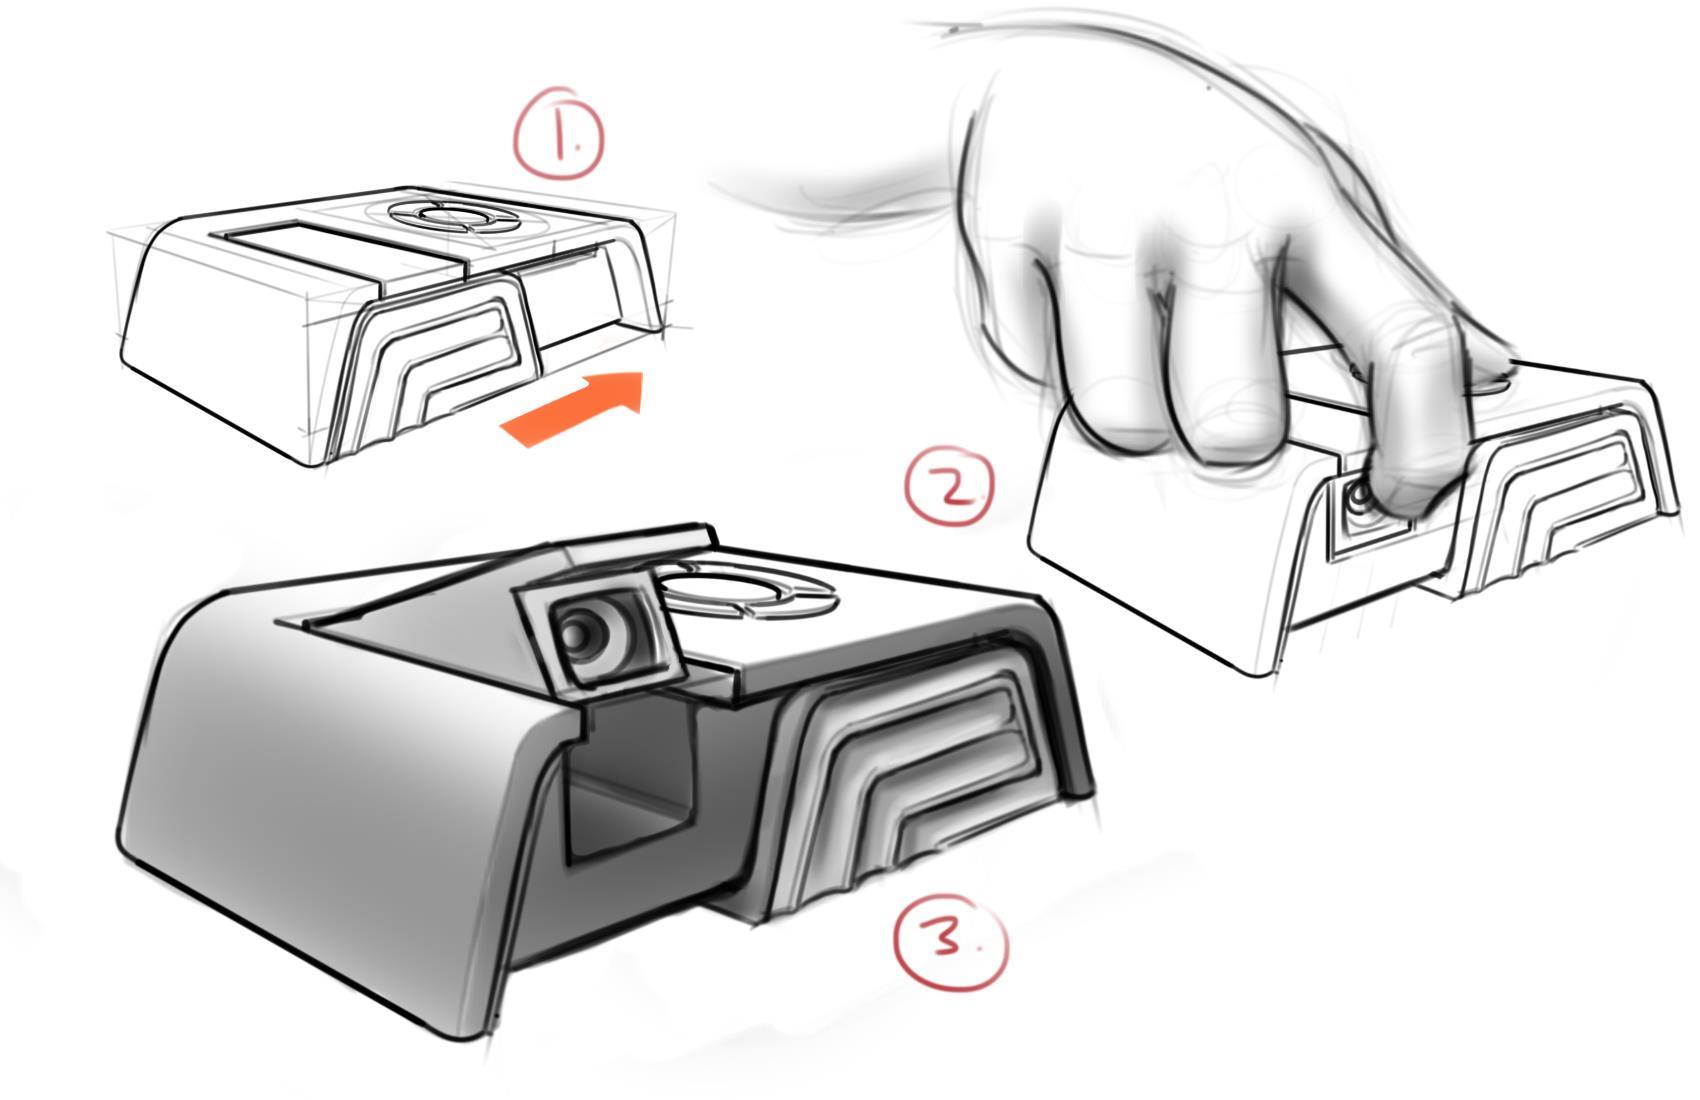 Projector Drawing3.jpg